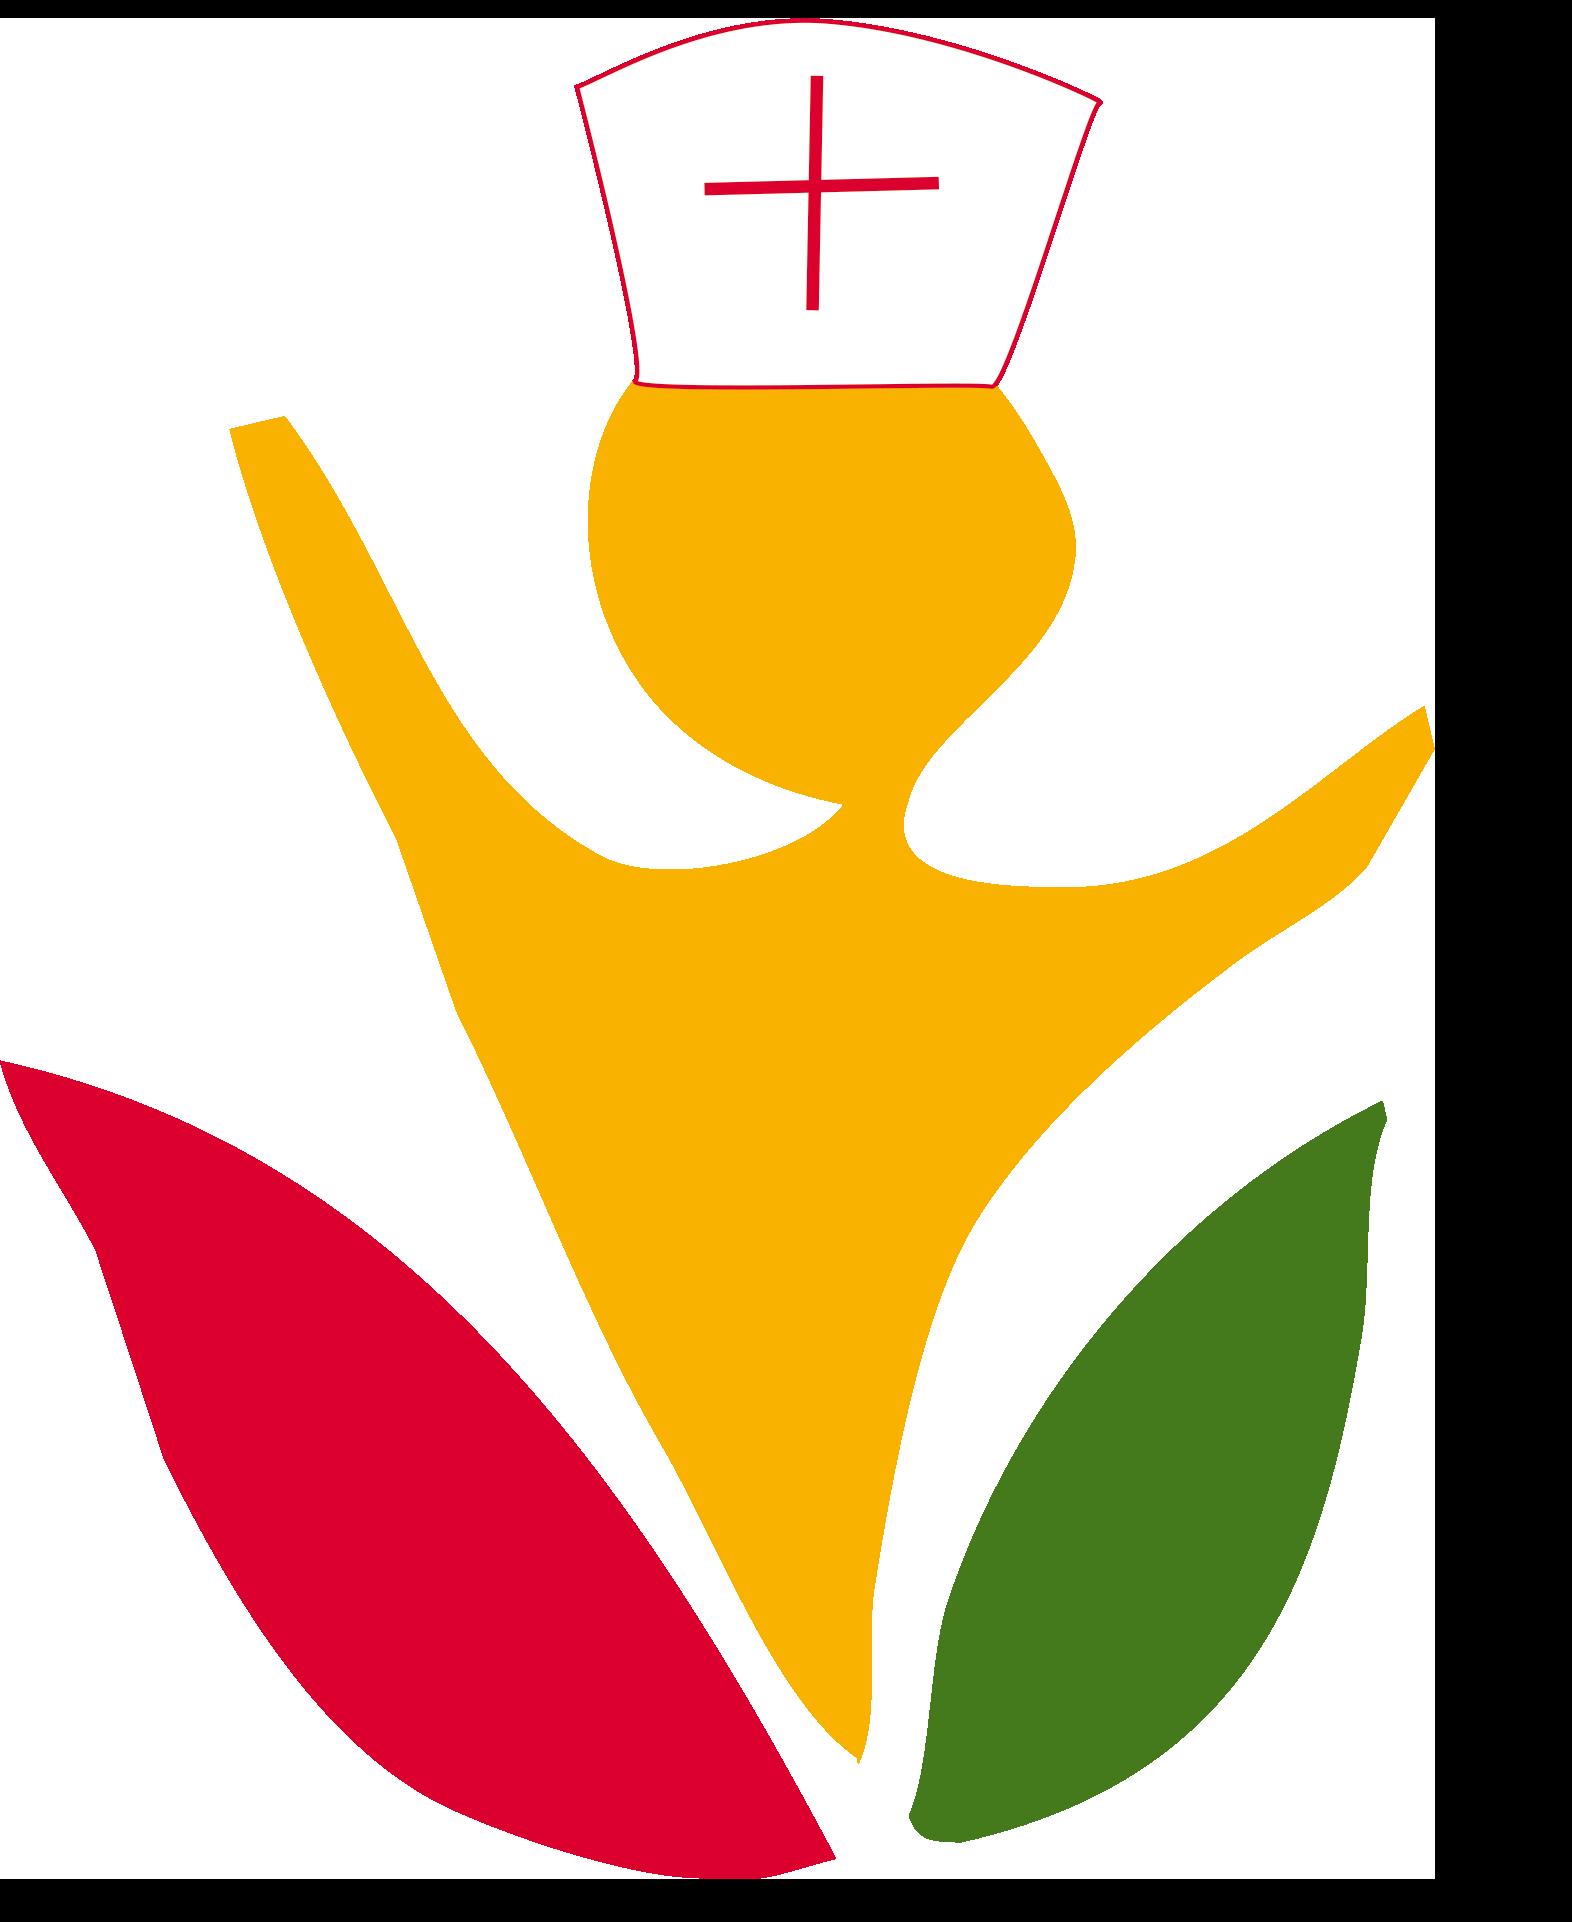 Aide et action ngo. Donation clipart livelihood project